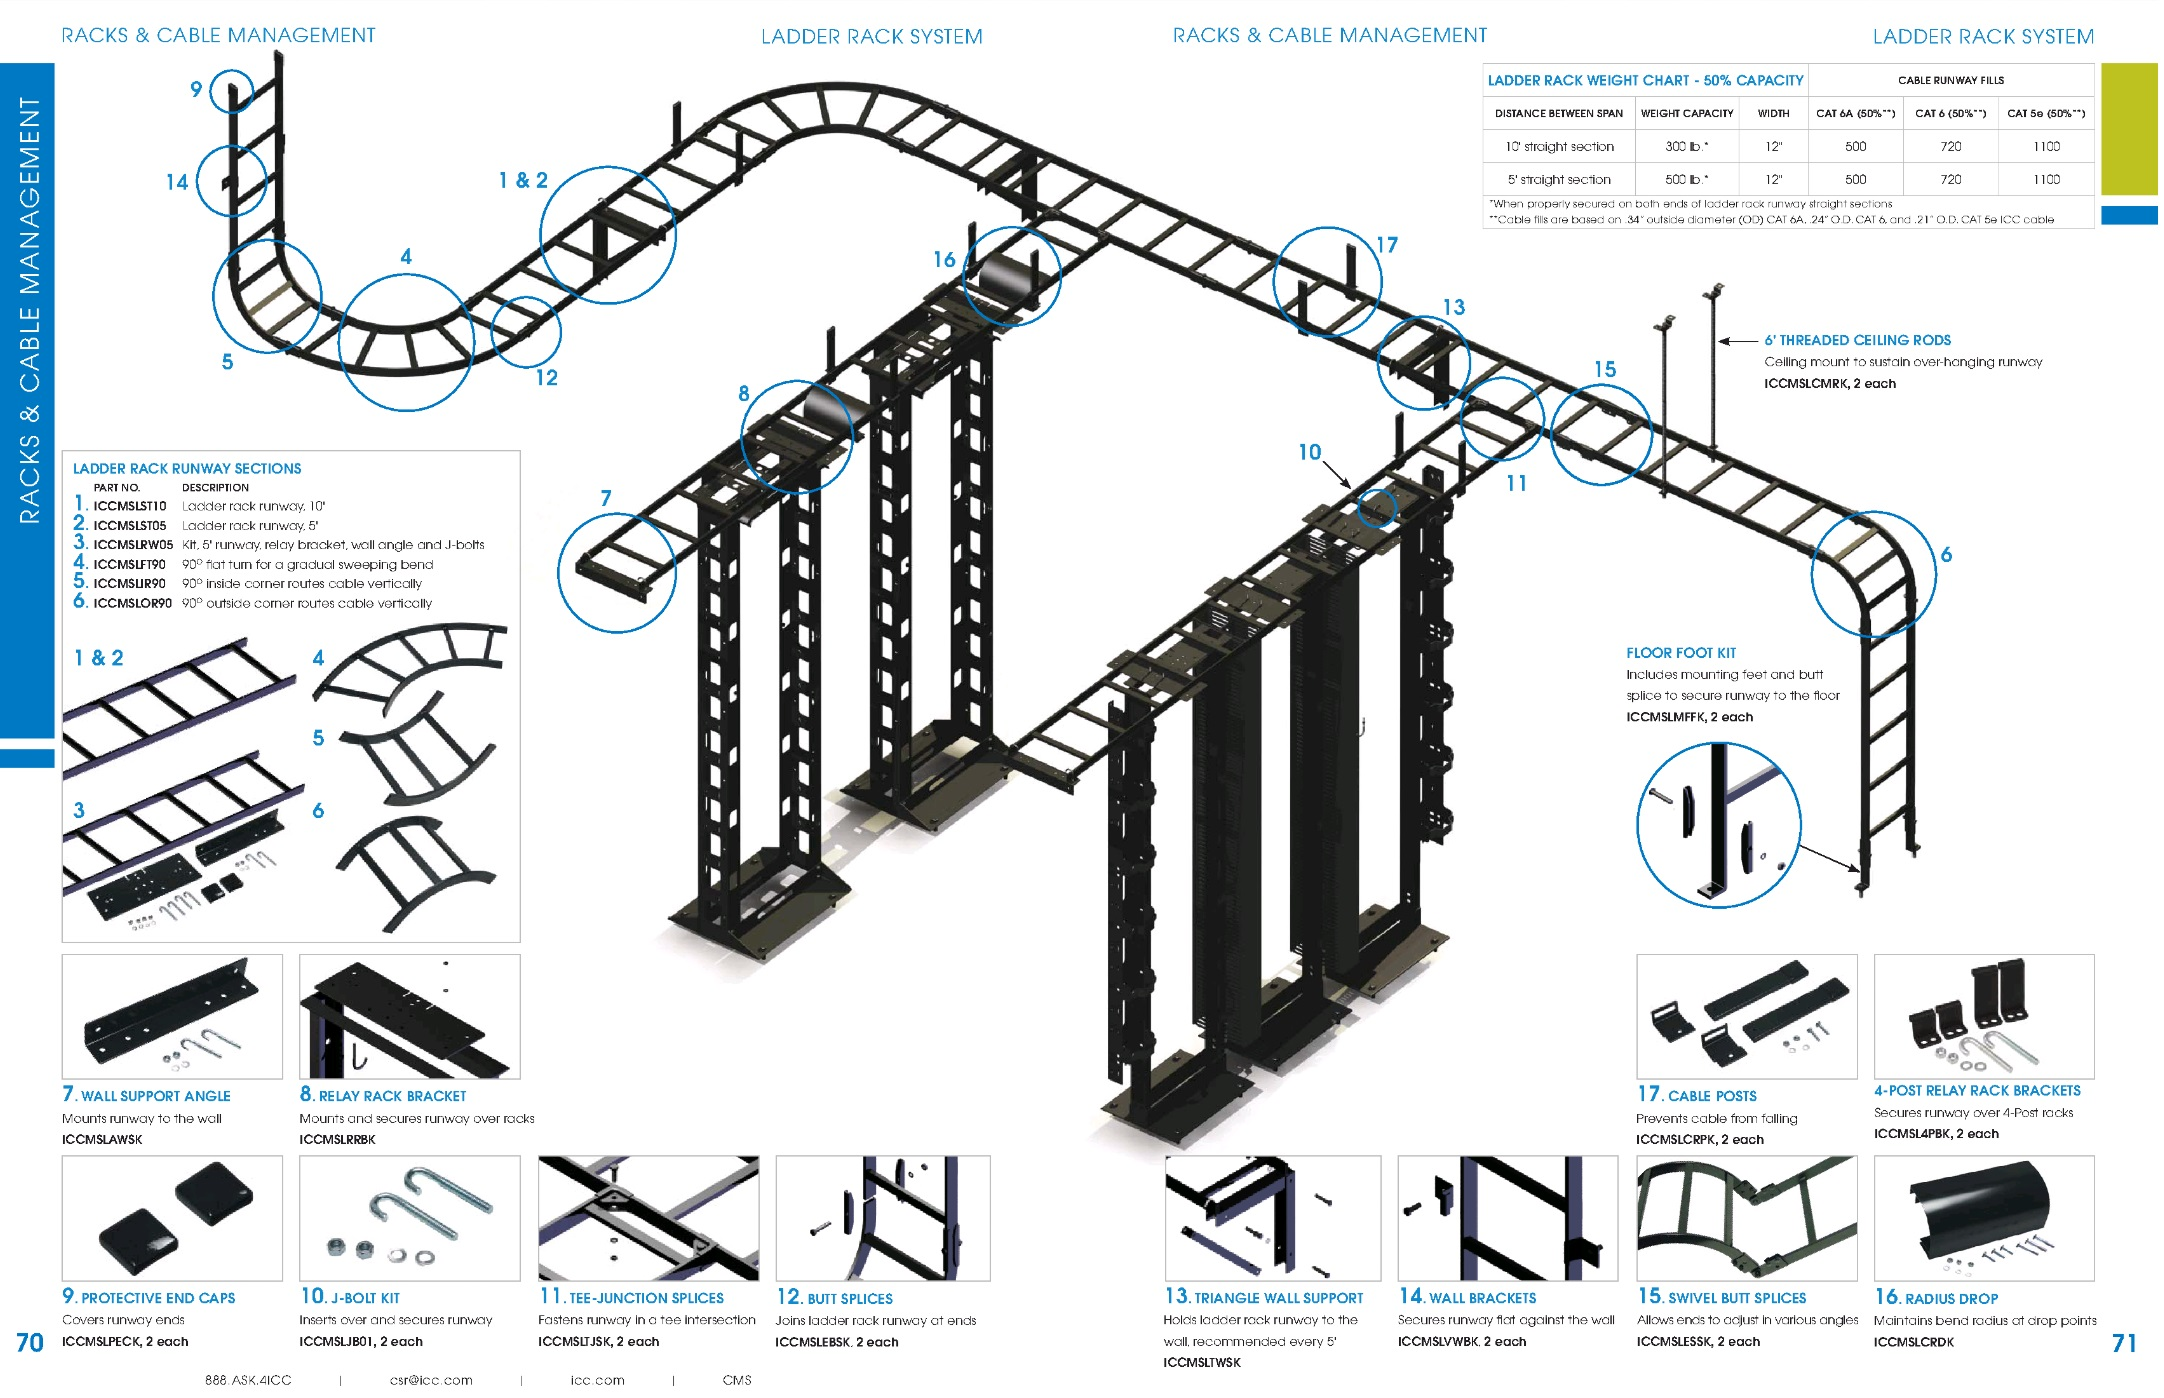 Ladder Rack Relay Diagram - DIY Wiring Diagrams •